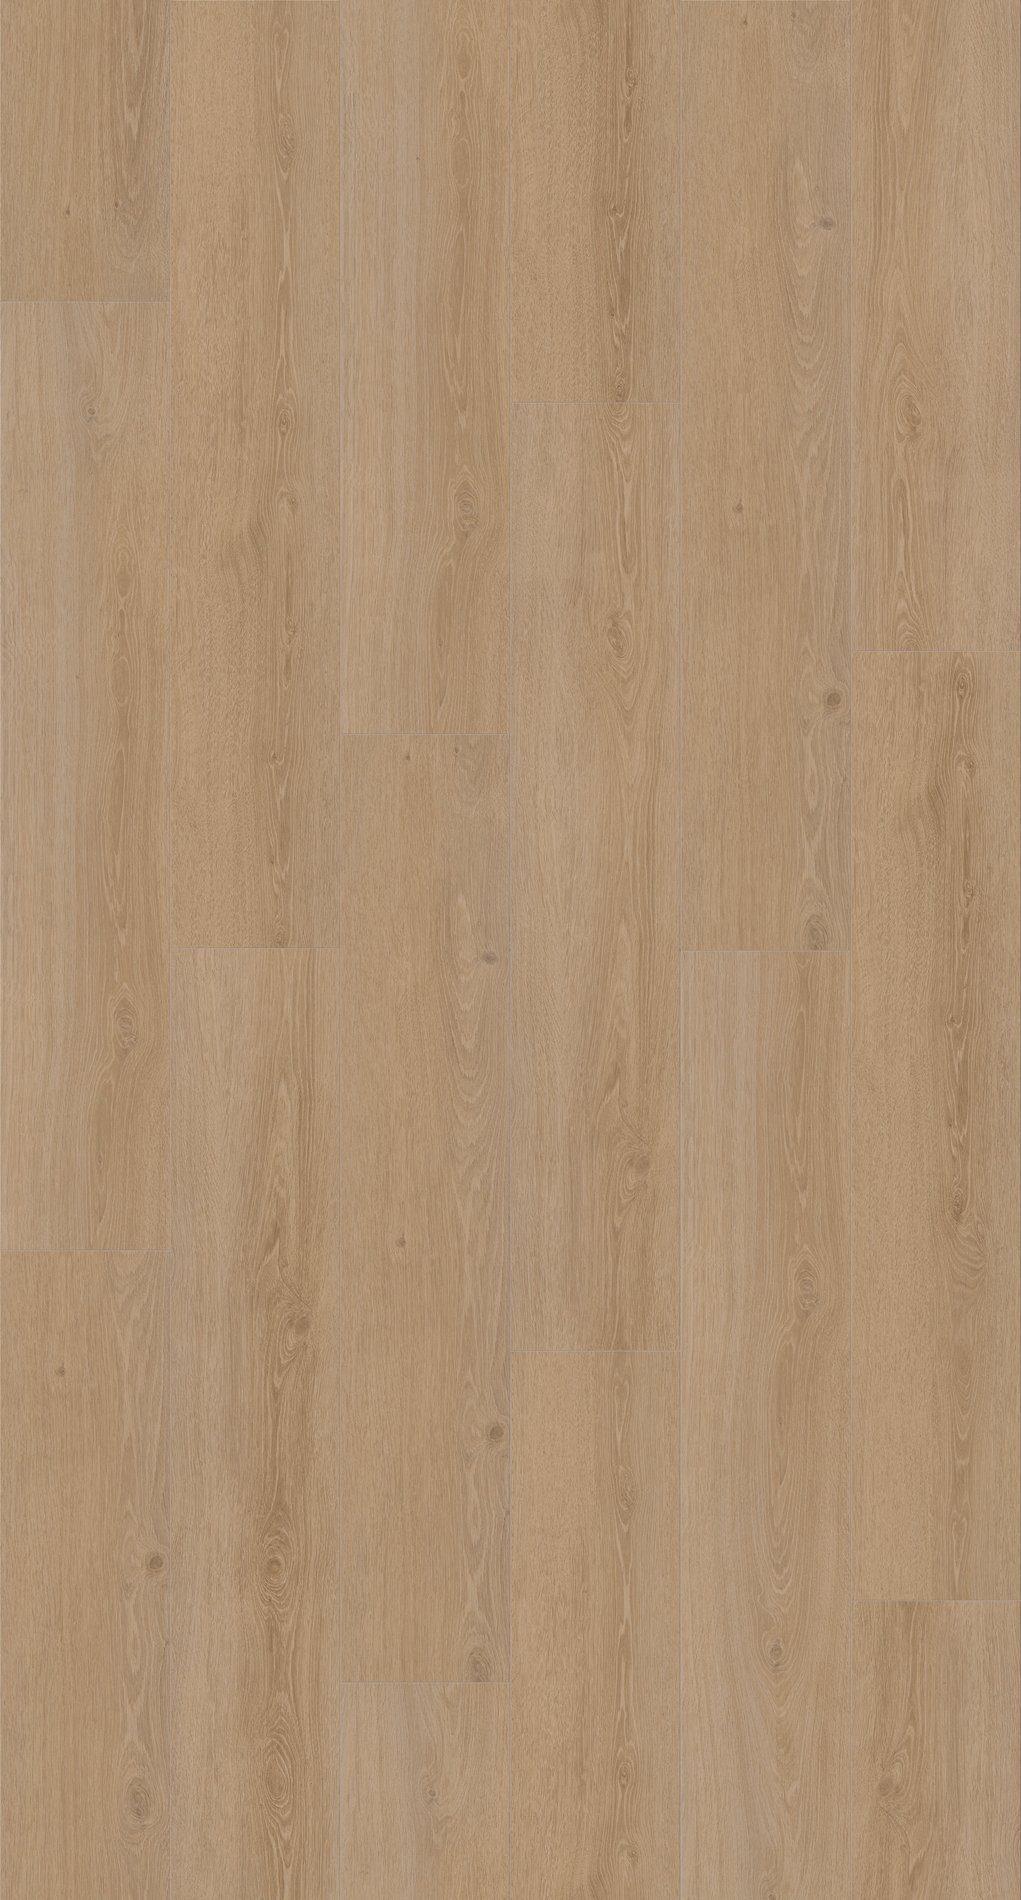 PARADOR Packung: Vinylboden »Classic 2030 - Eiche Studioline Natur«, 1214 x 216 x 8,6 mm, 1,8 m²